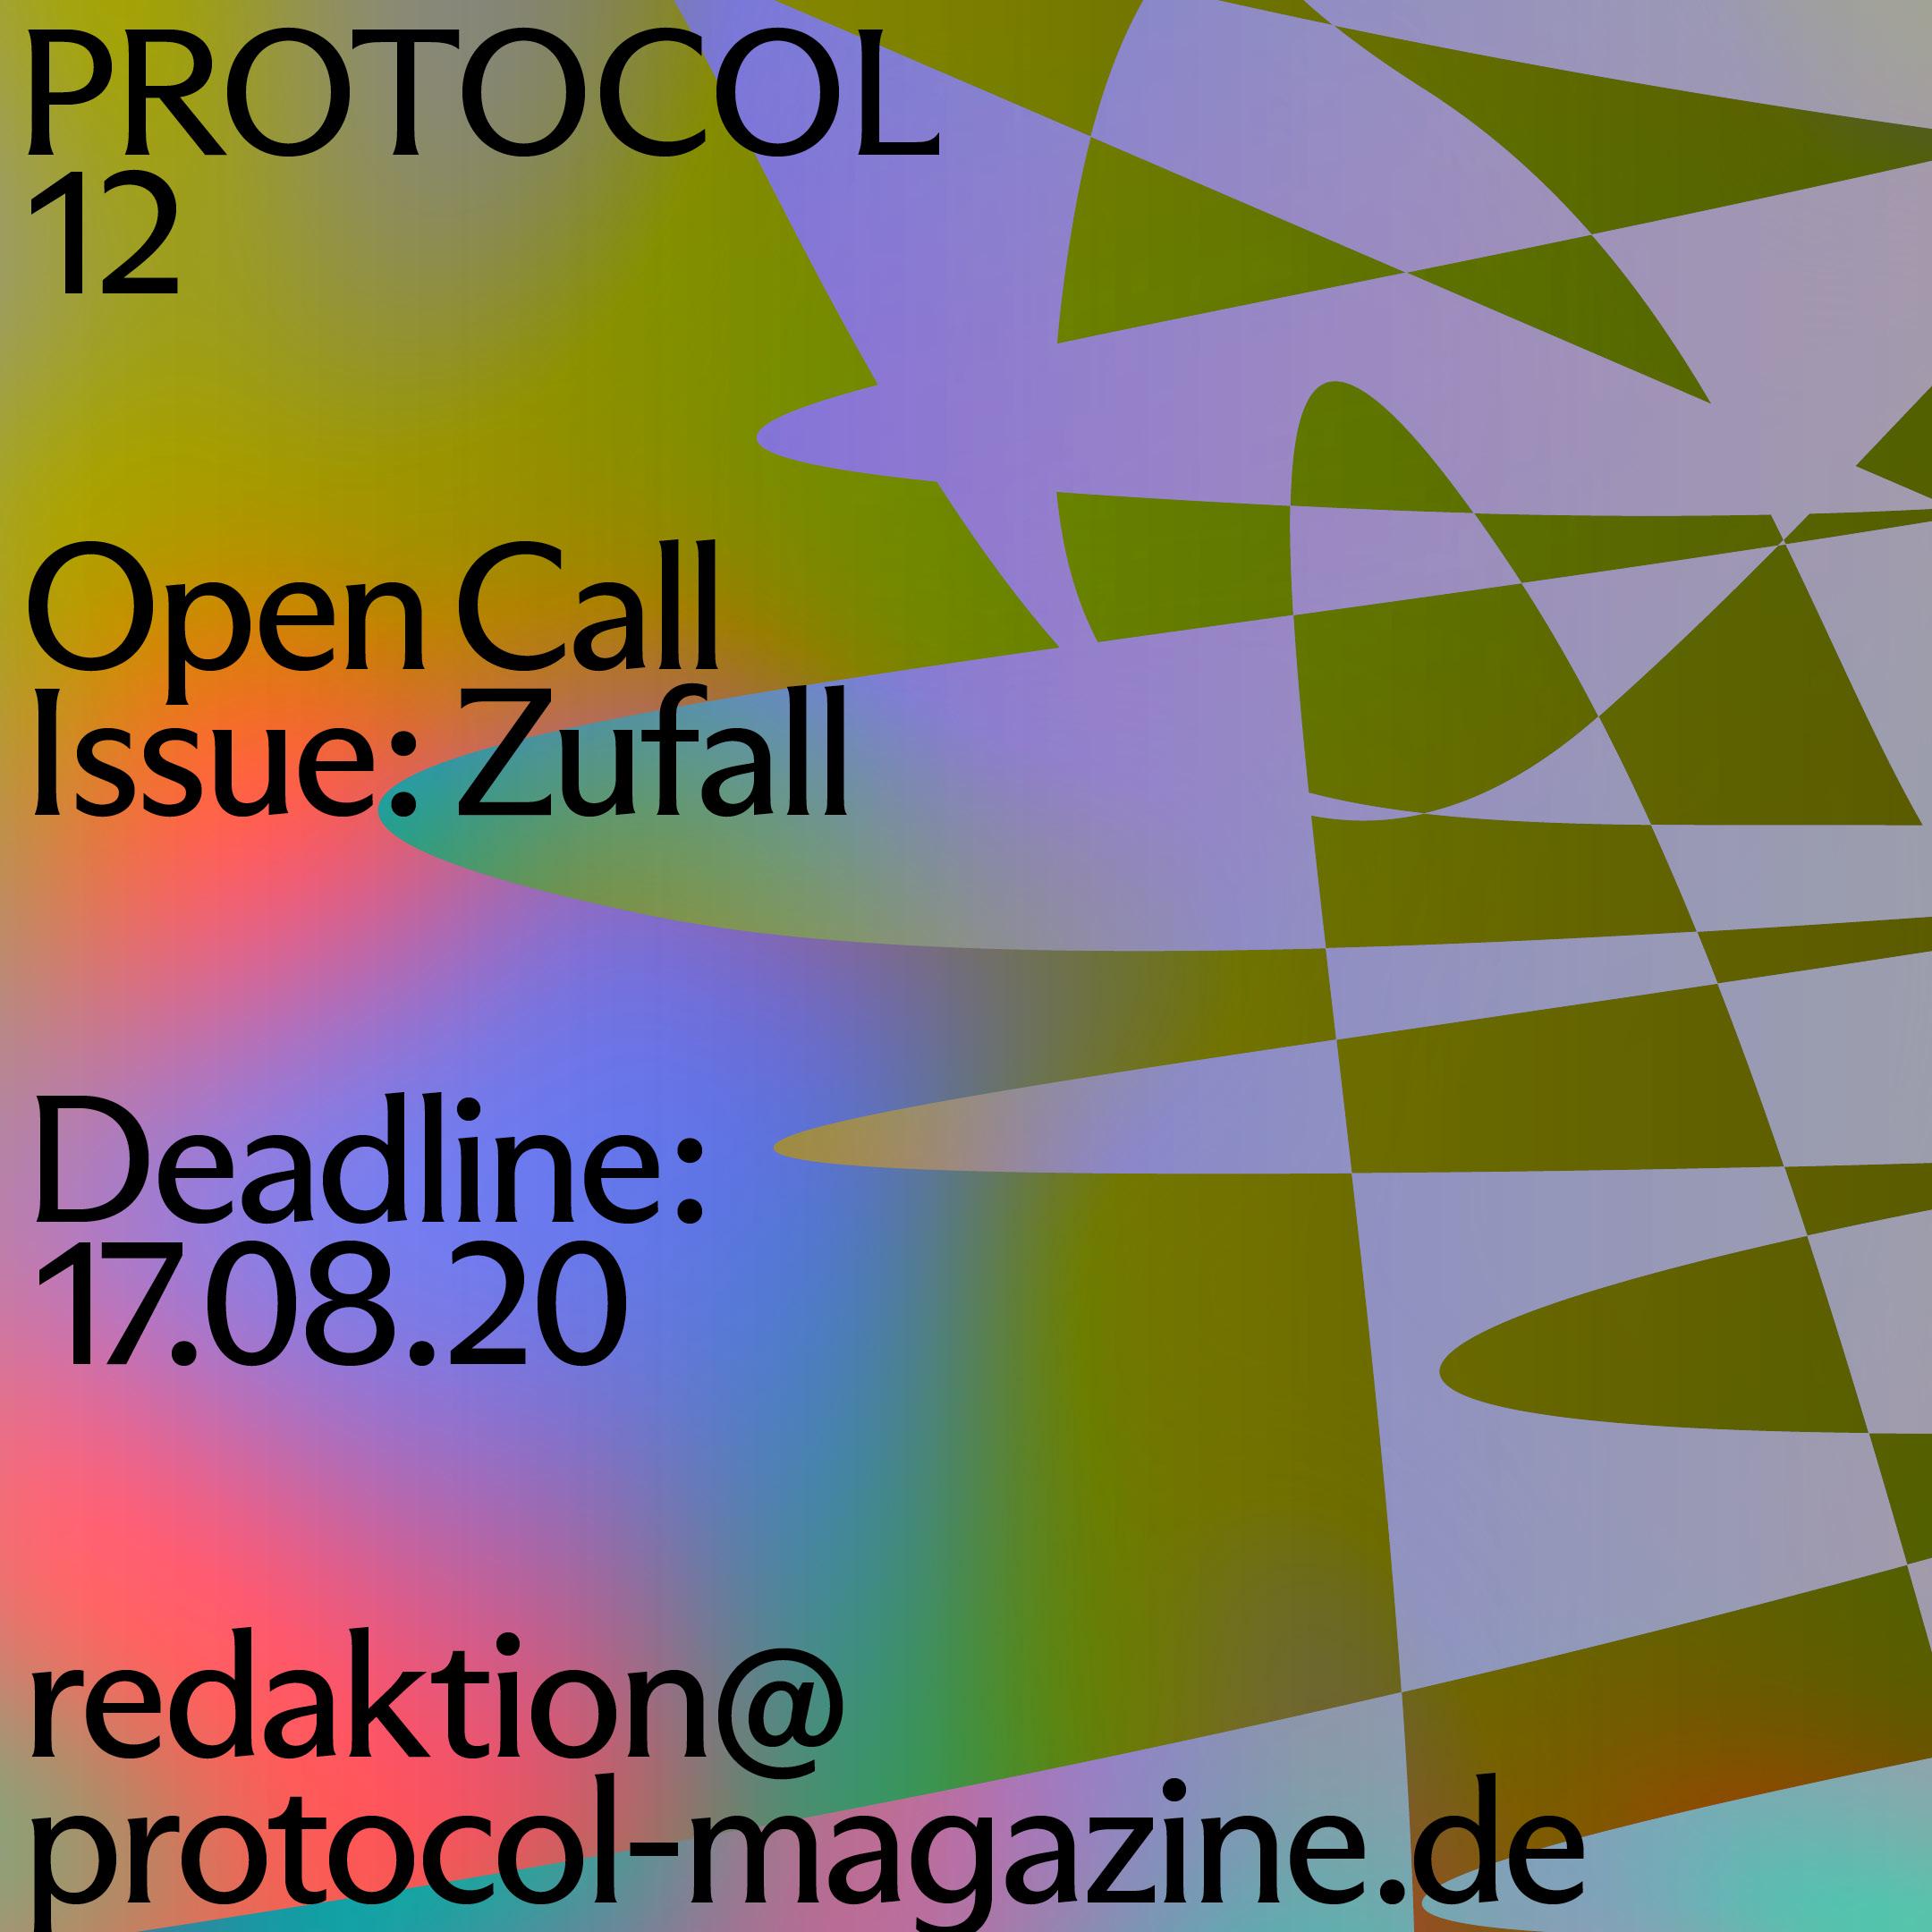 p12_Instagram-Redaktion_Protocol-Magazin_Magazin-fuer-Architektur-im-Kontext13